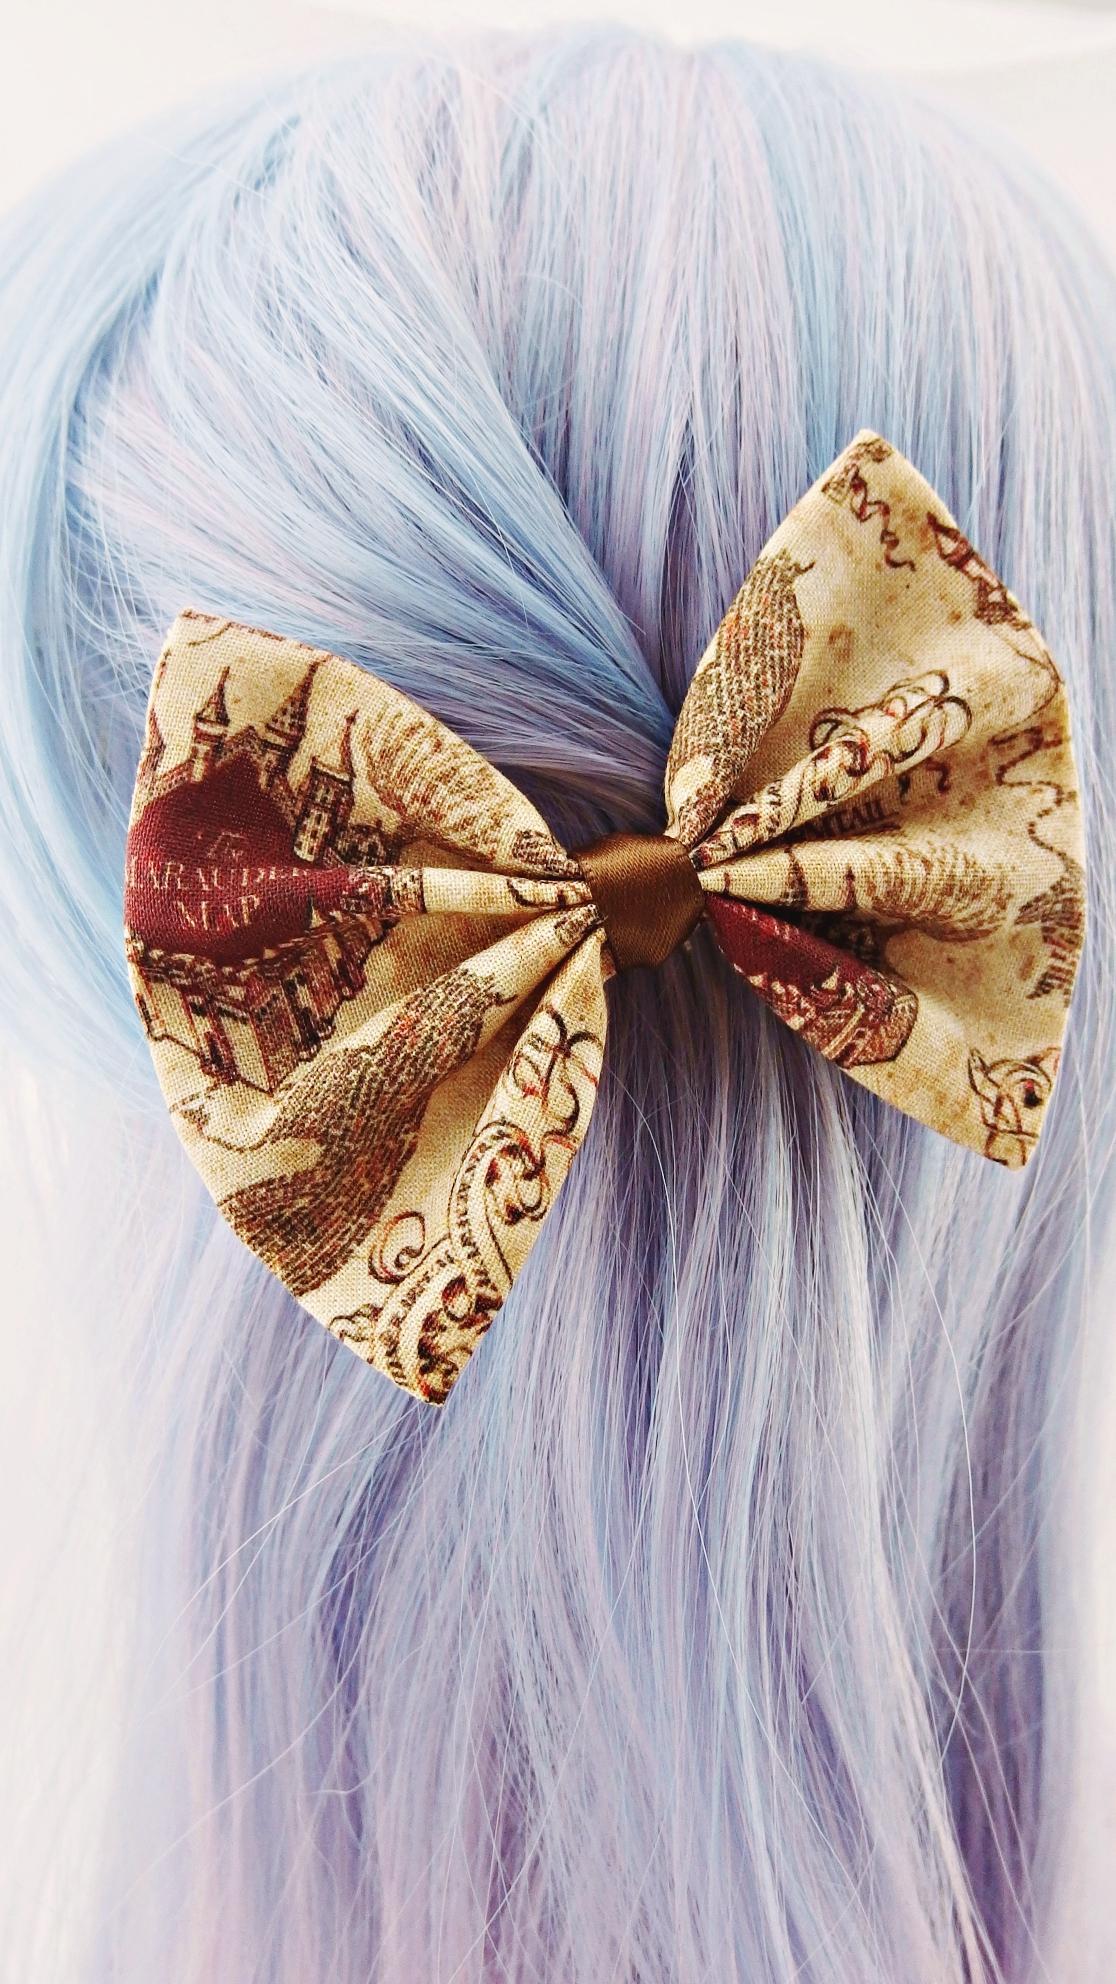 Beautiful Handmade 5 Inch Spooky Harry Potter Hogwarts Marauders Map Hair Bow